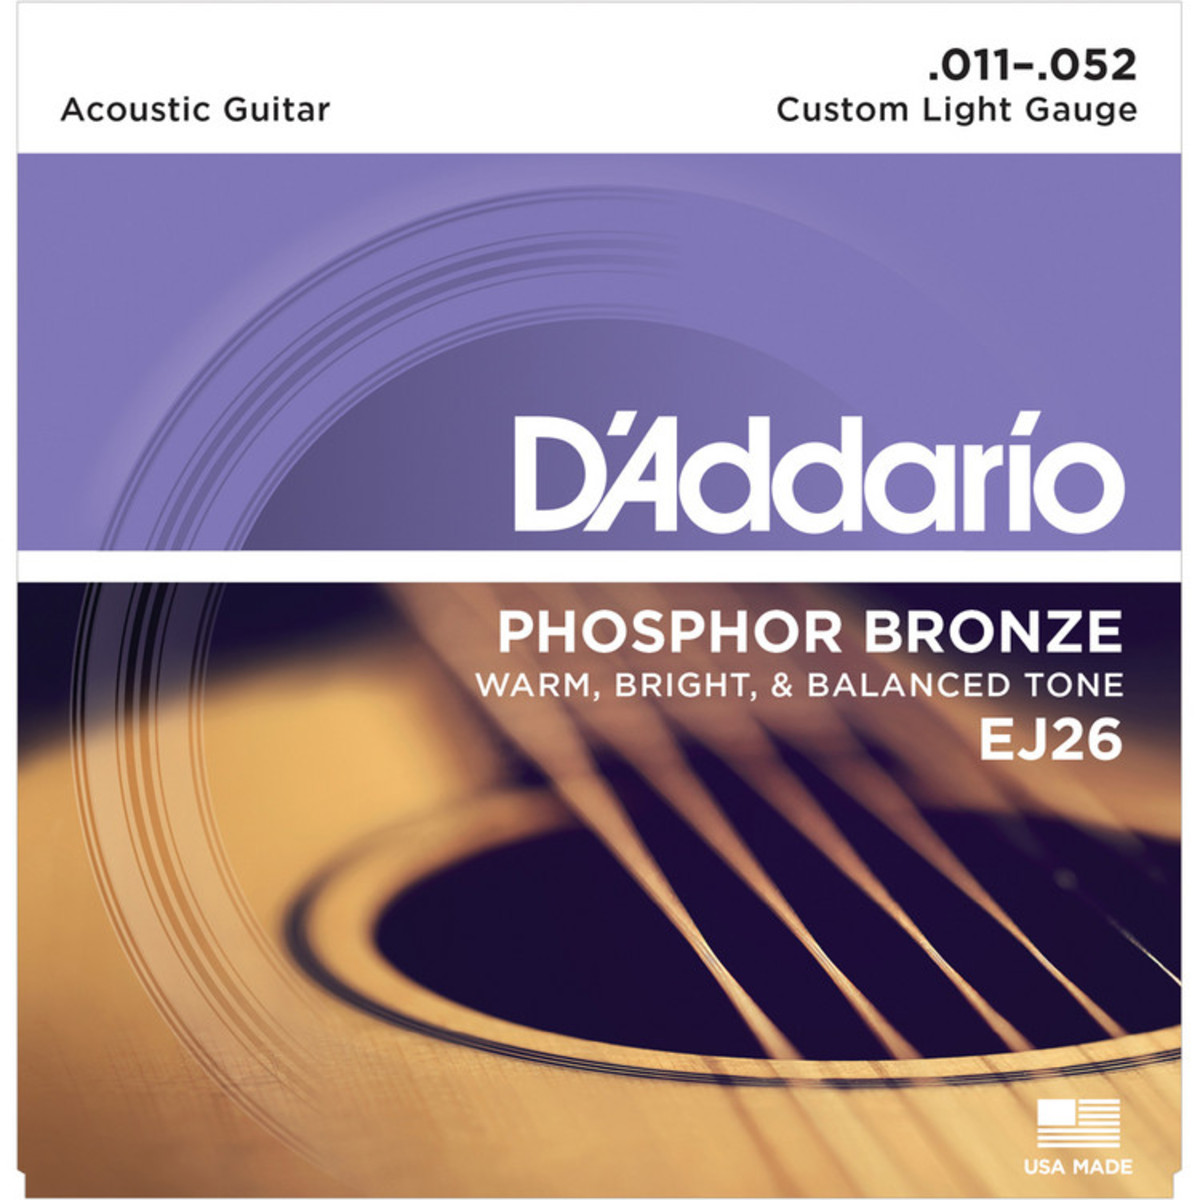 D'Addario EJ26 Phosphor Bronze Guitar Strings